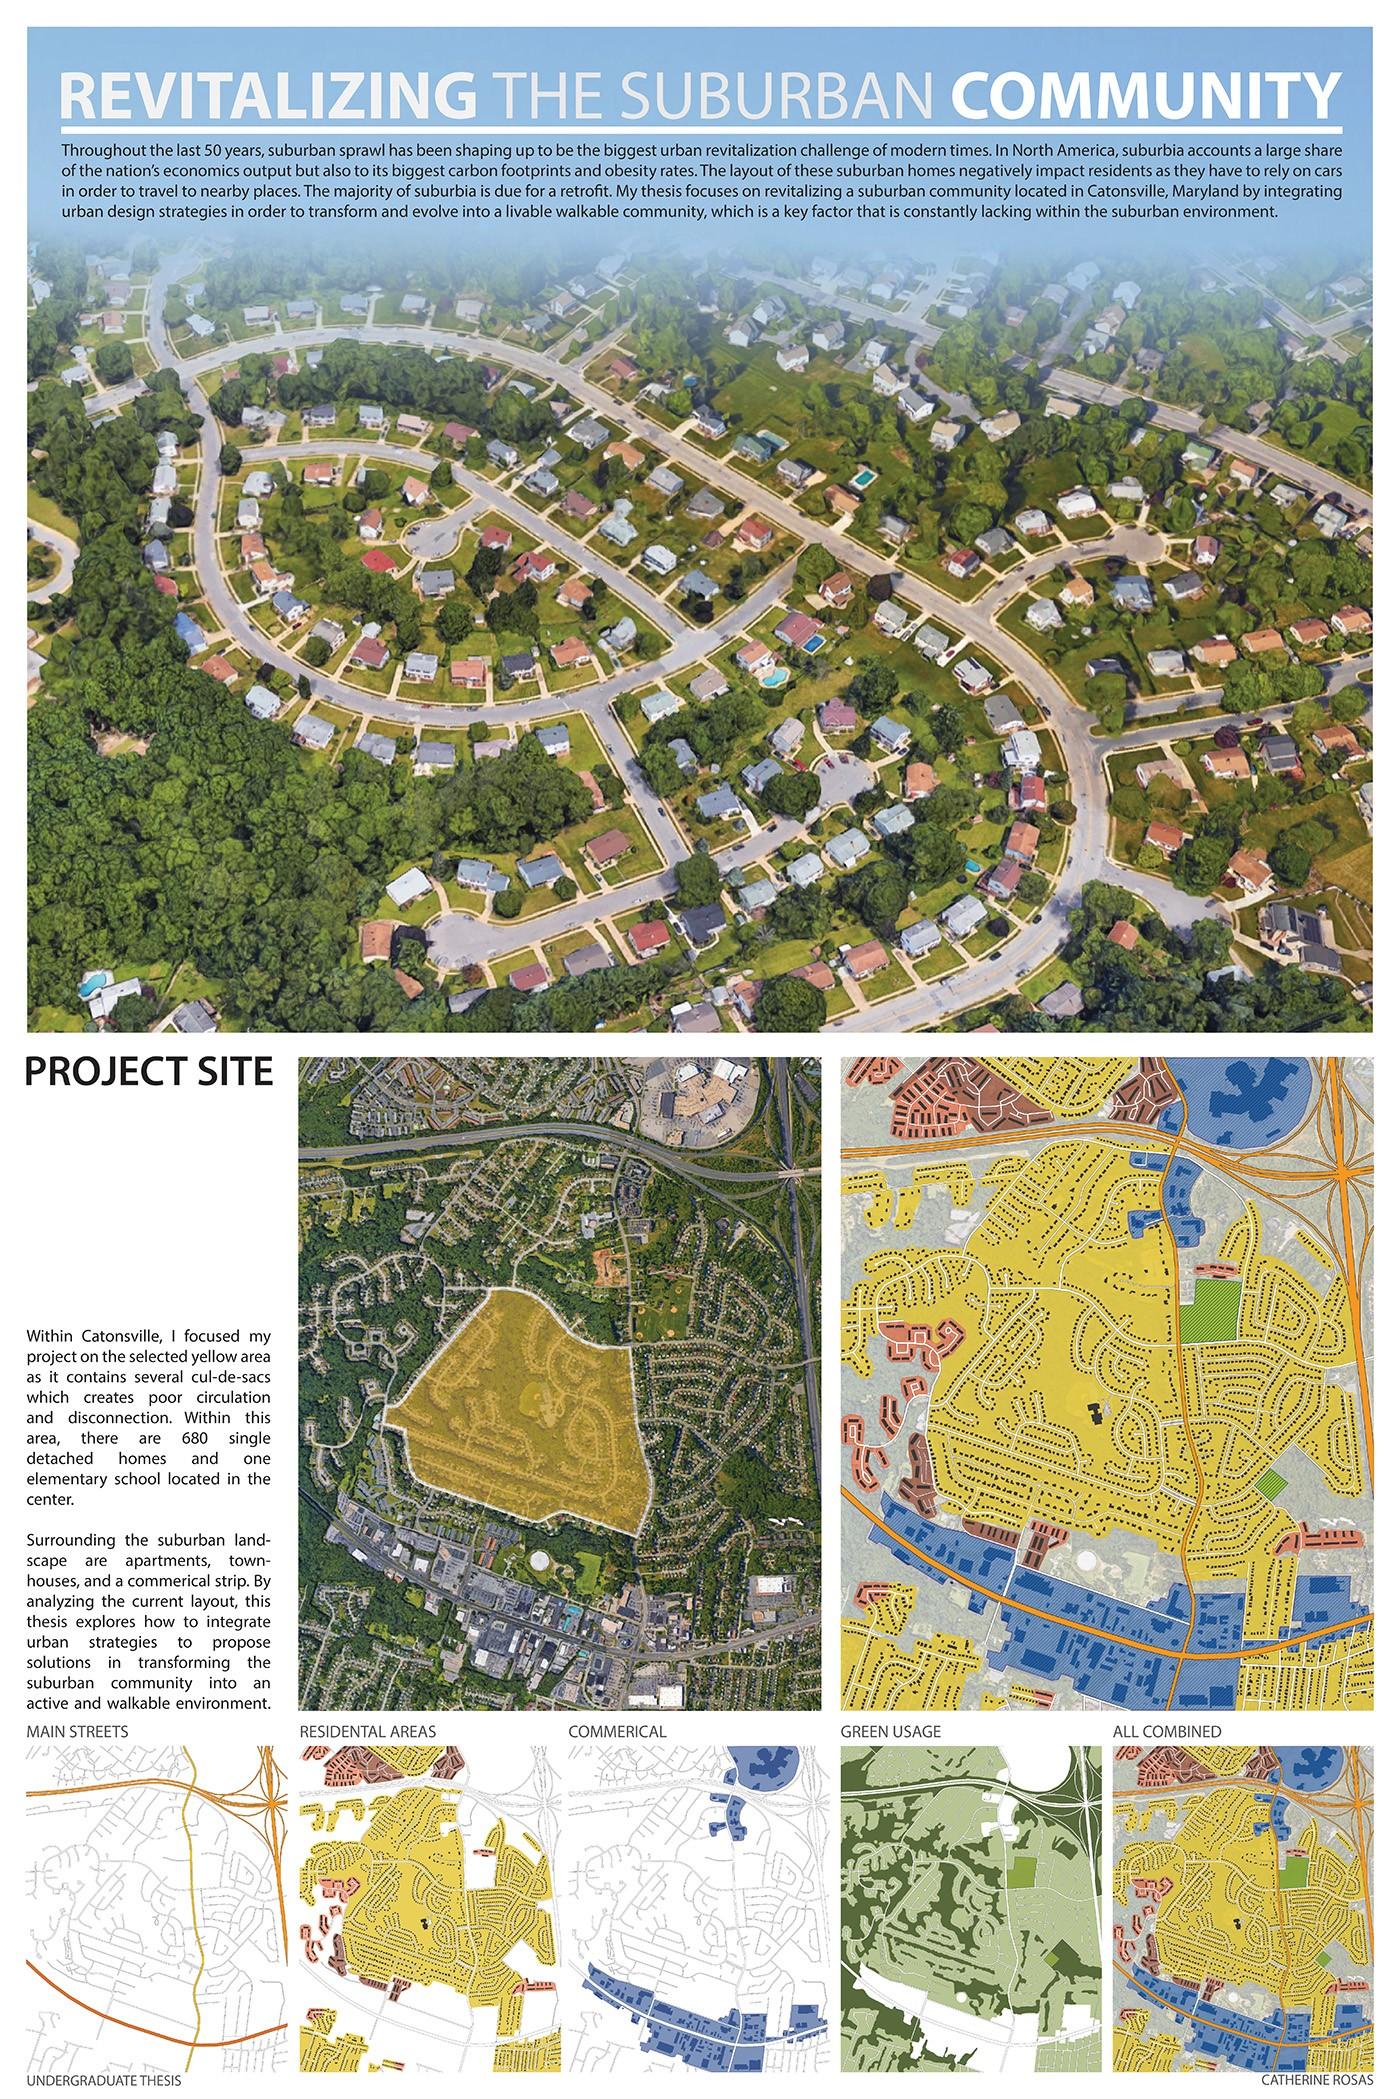 Revitalizing the Suburban Community